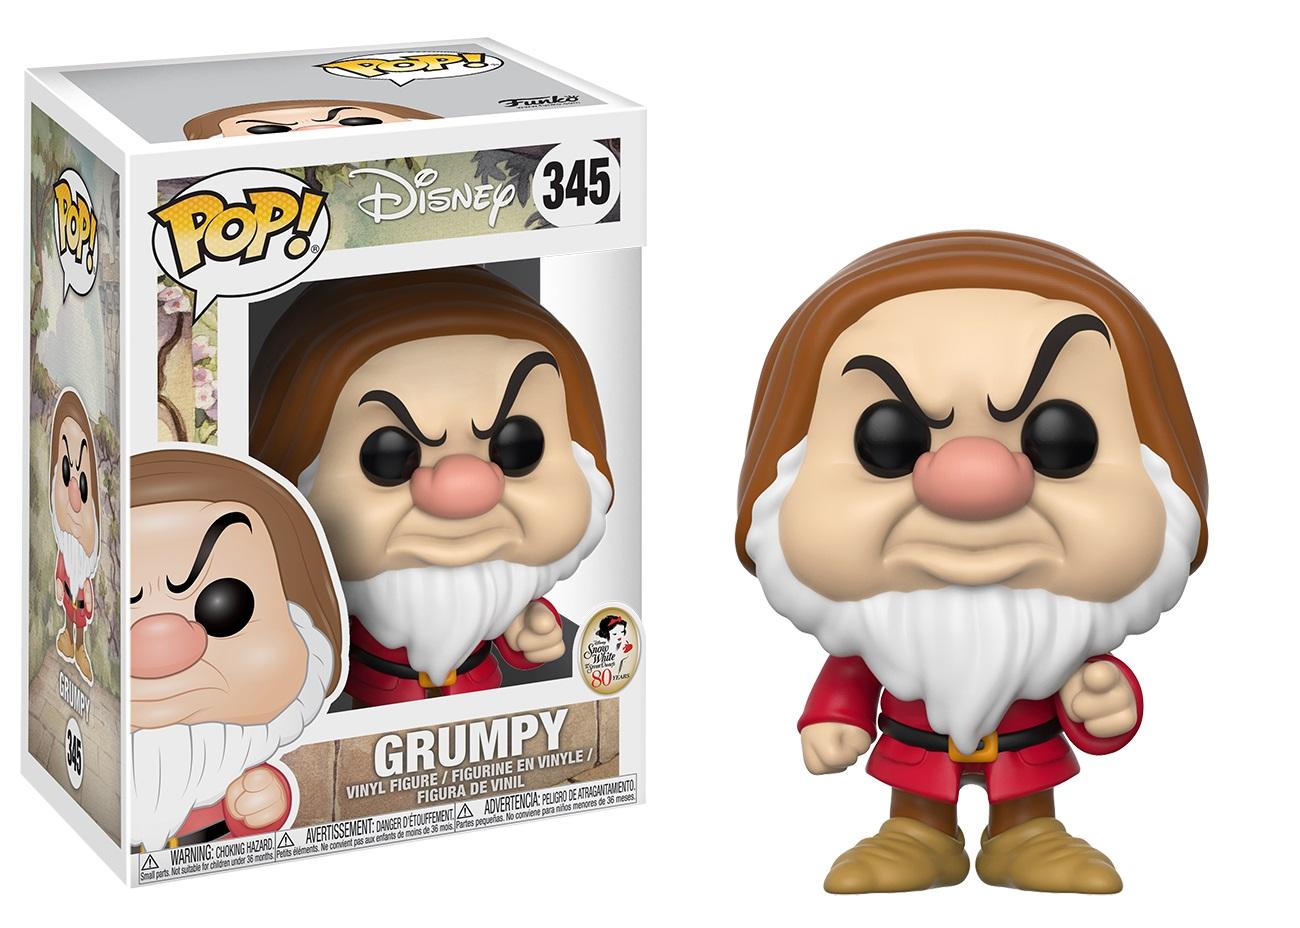 Product List Starbase Atlanta Page 97 Bott Funko Pop Kingdom Hearts Riku Walt Disney Snow White Seven Dwarfs Grumpy Vinyl Figure Toy 345